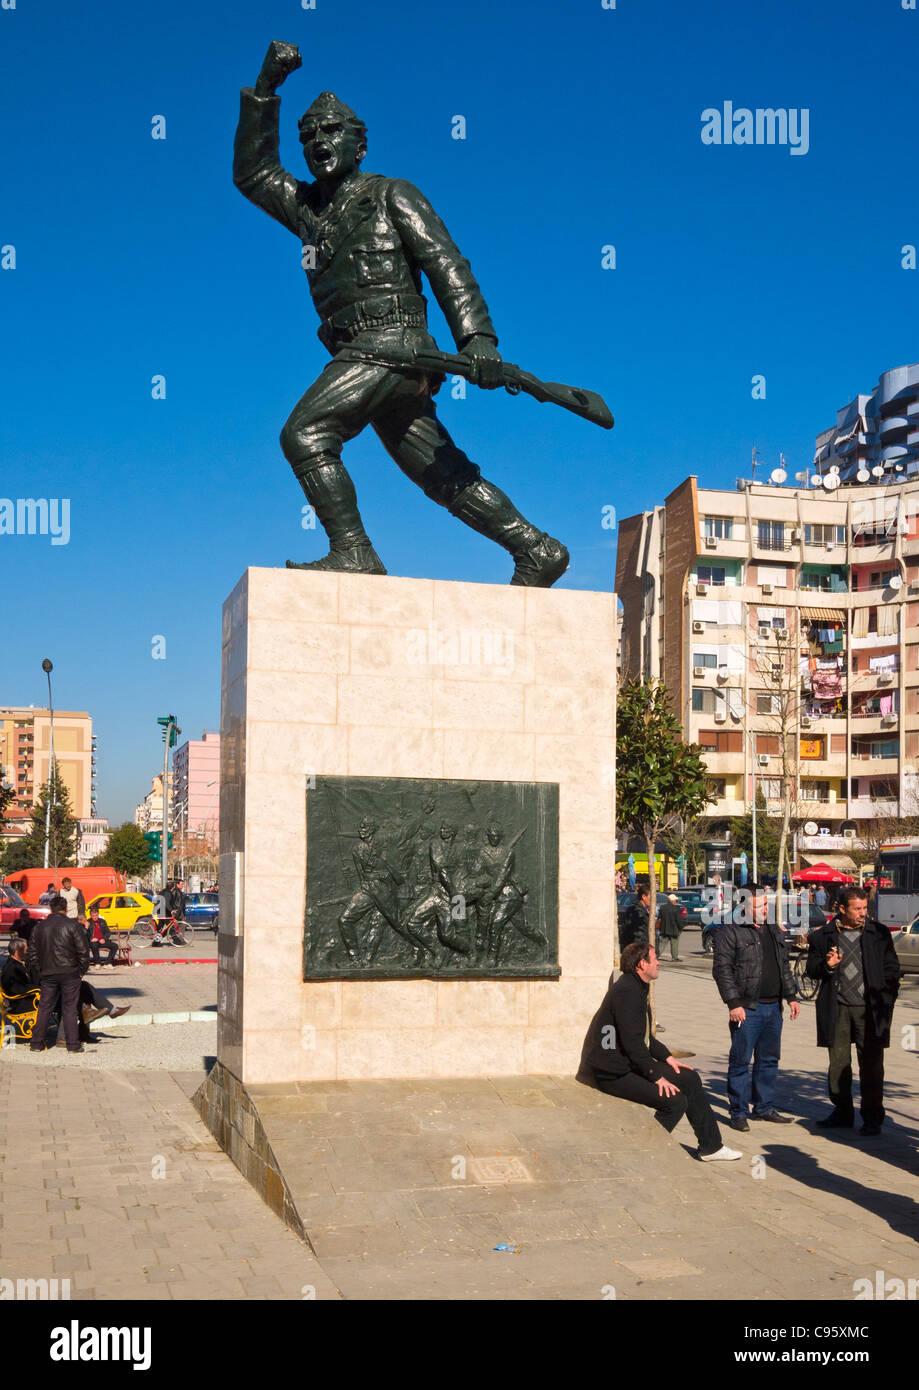 Unknown Soldier monument and statue in Sulejman Pasha Square, Tirana, Albania. - Stock Image